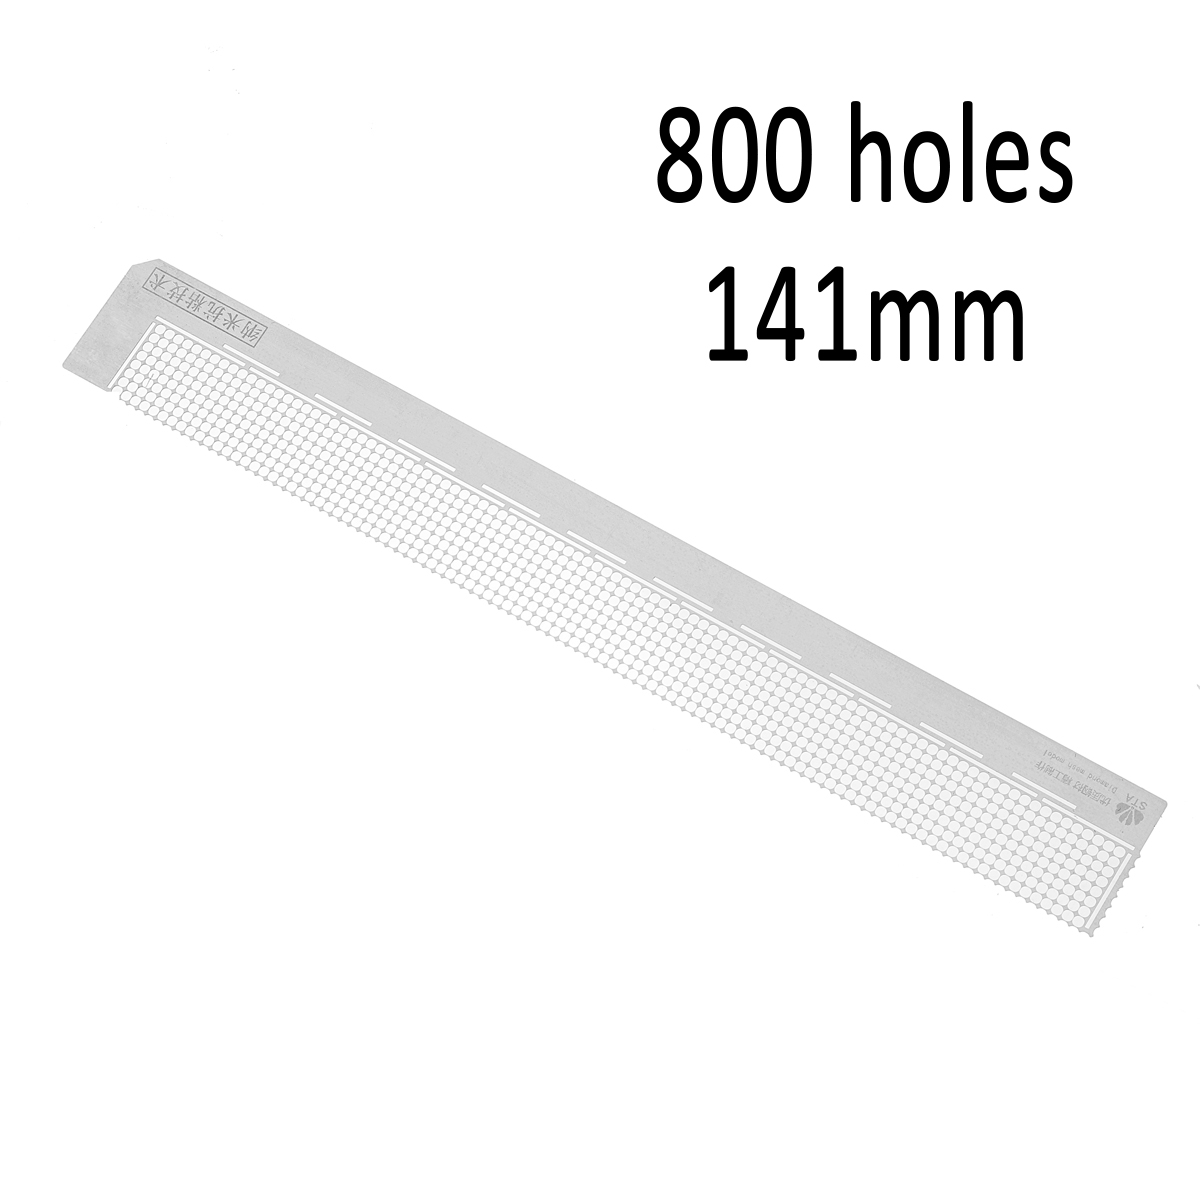 Nano Point Drill Ruler Cross Stitch Diamond Embroidery Paste Sticker Dotting Rhinestone Point Anti-Stick Drilling Ruler Tools Accessories Peyan 5D DIY Diamond Painting Ruler Tools